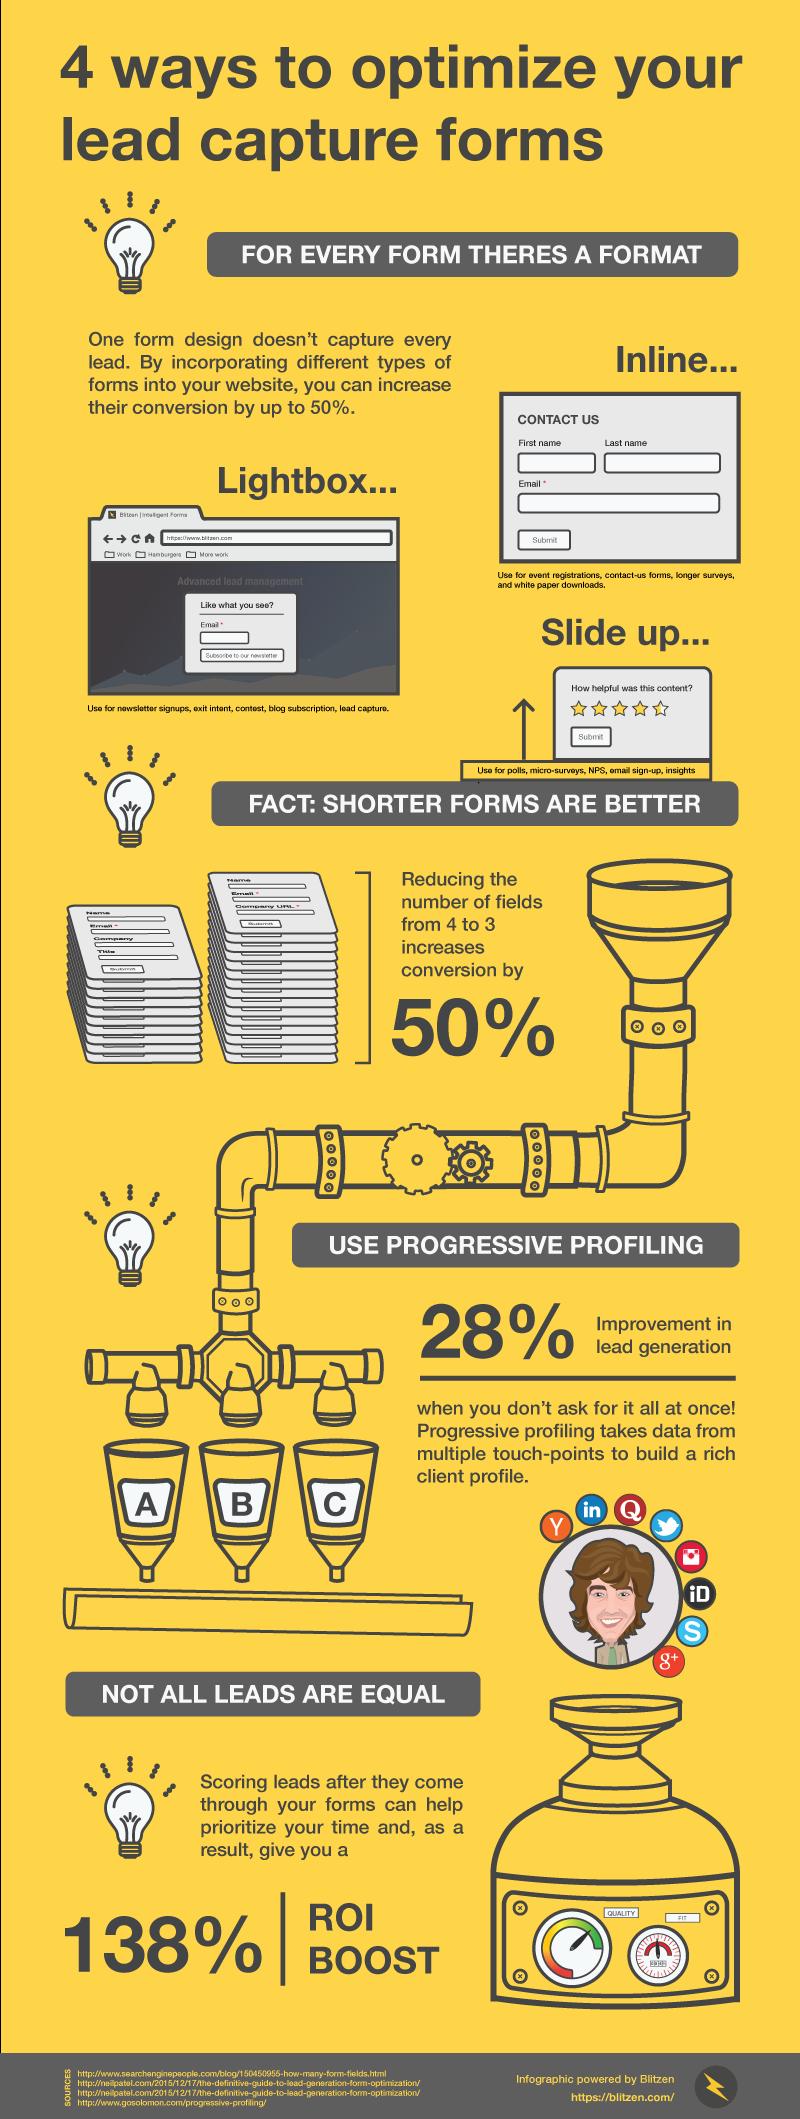 blitzen-infographic-2